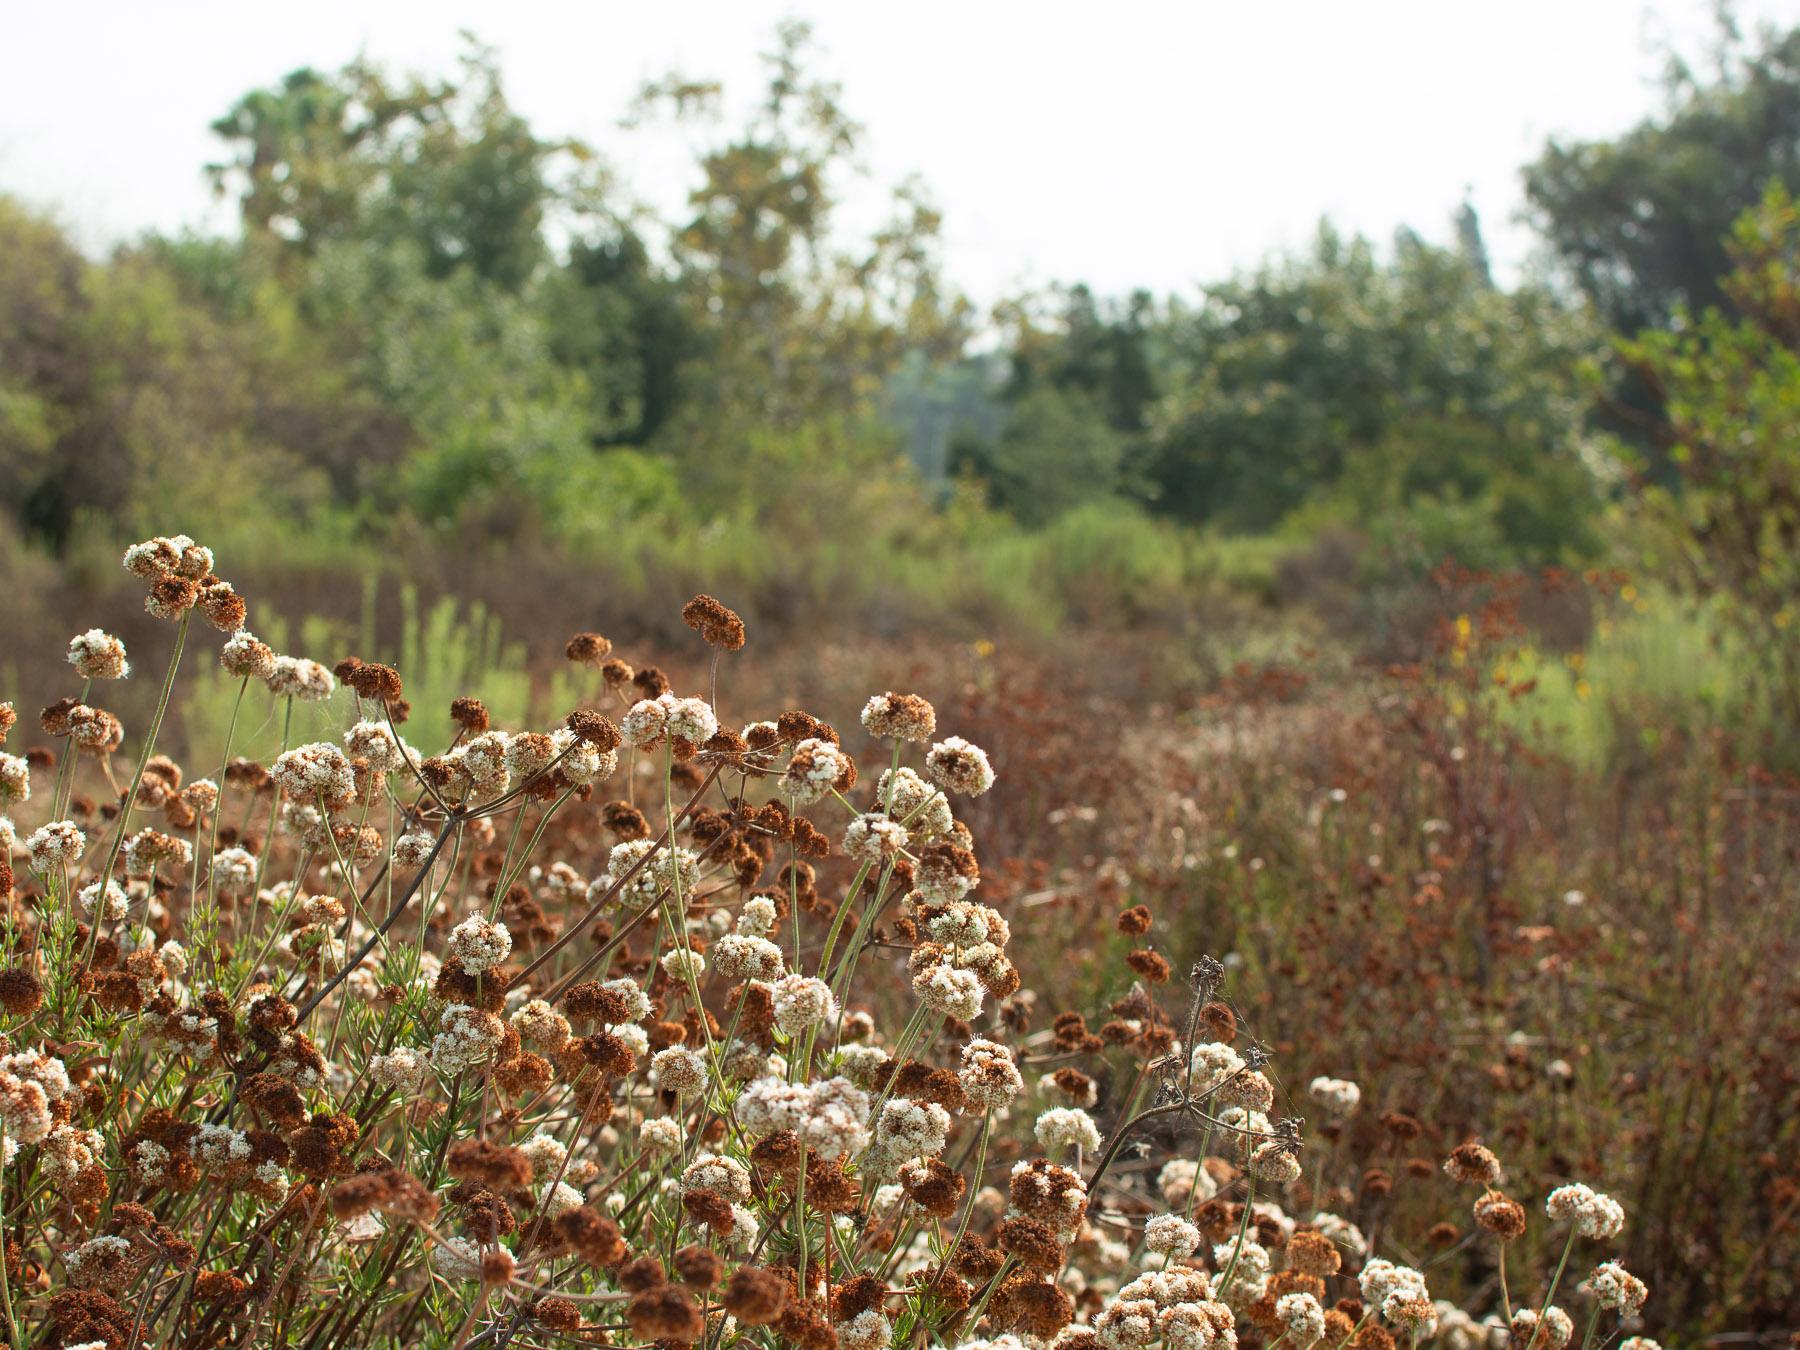 Late August buckwheat